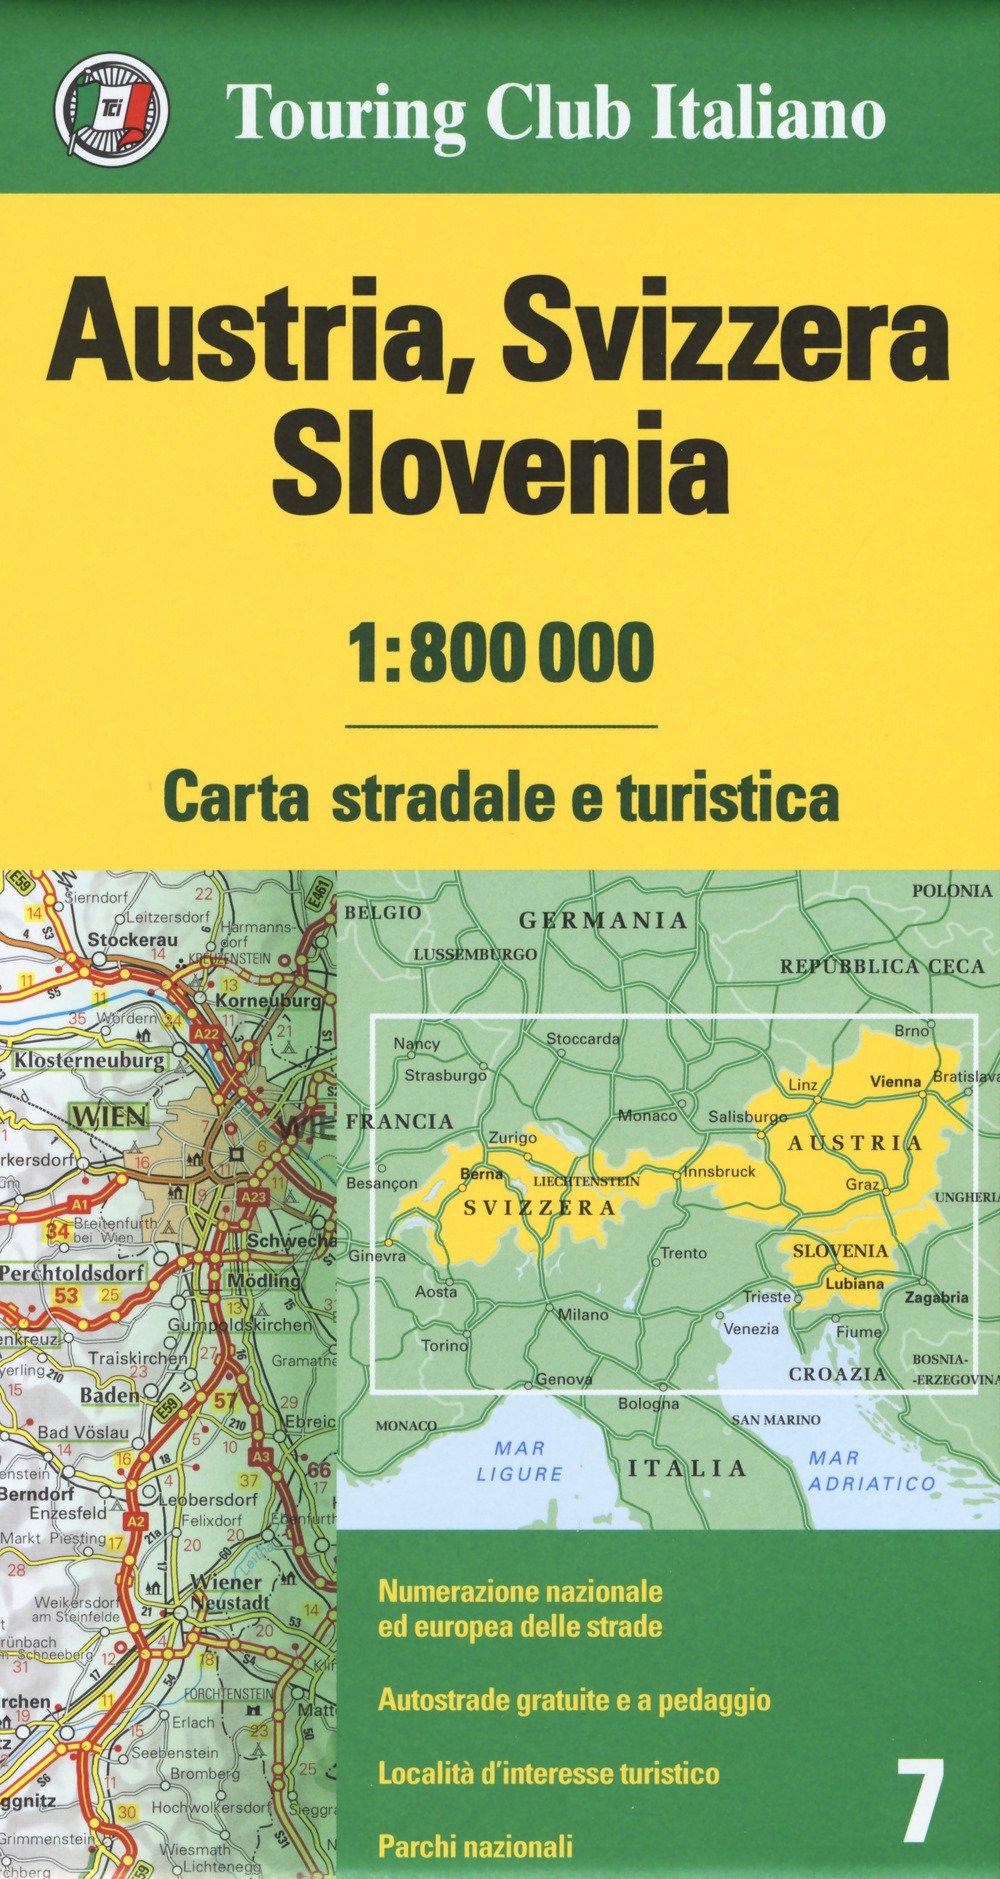 Cartina Slovenia Stradale.Amazon It Austria Svizzera Slovenia 1 800 000 Carta Stradale E Turistica Aa Vv Aa Vv Libri